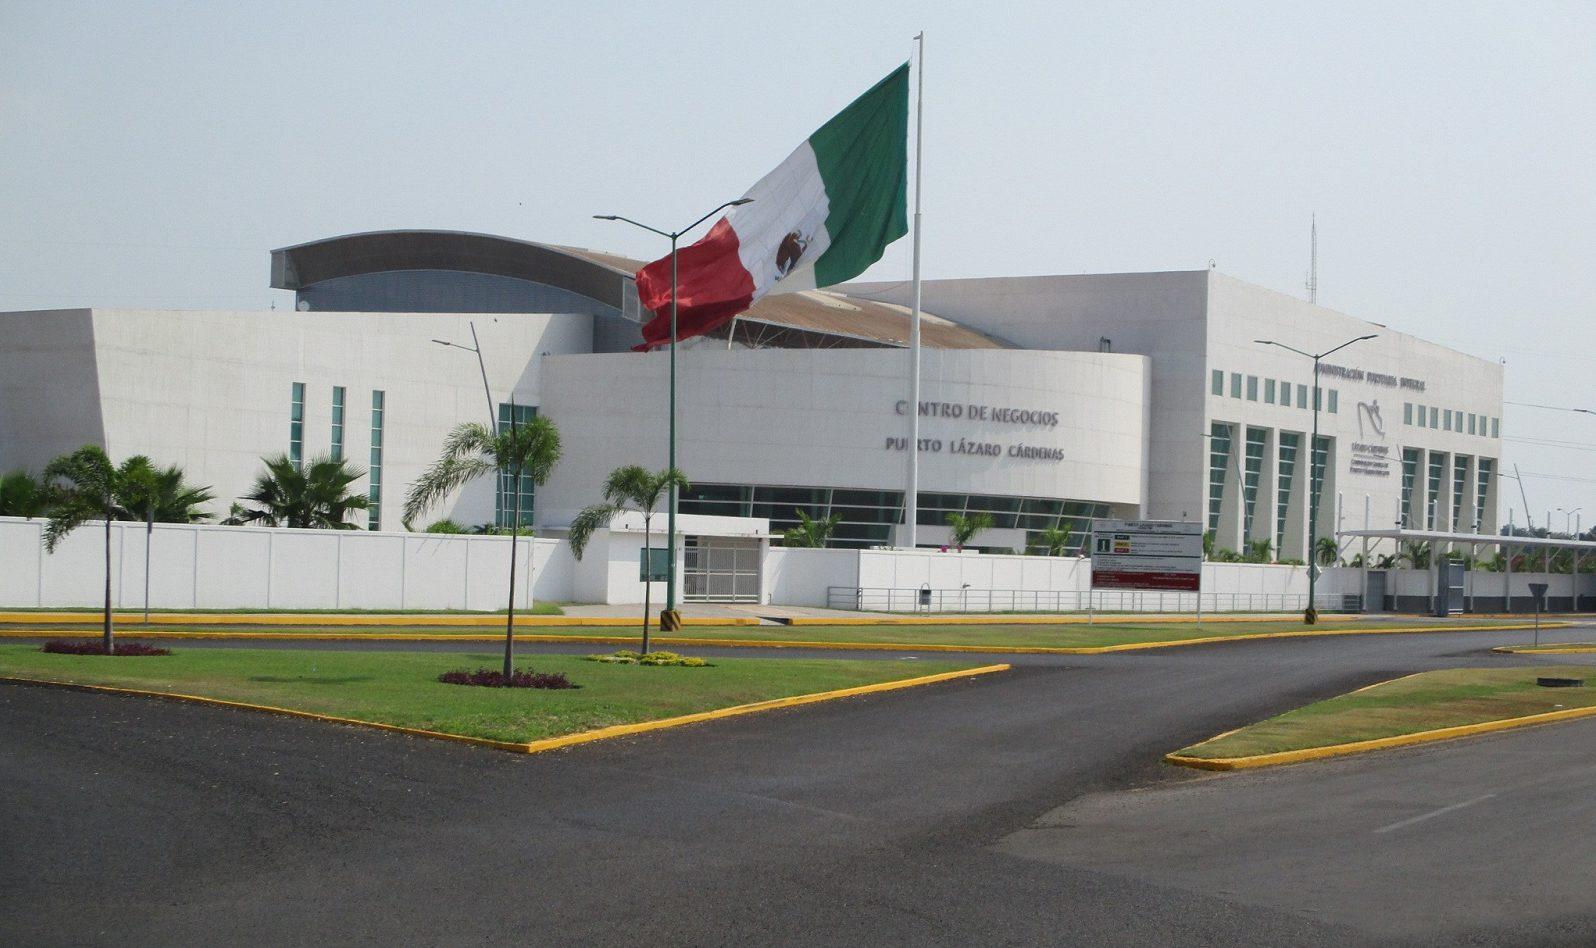 Port of Lazaro Cardenas